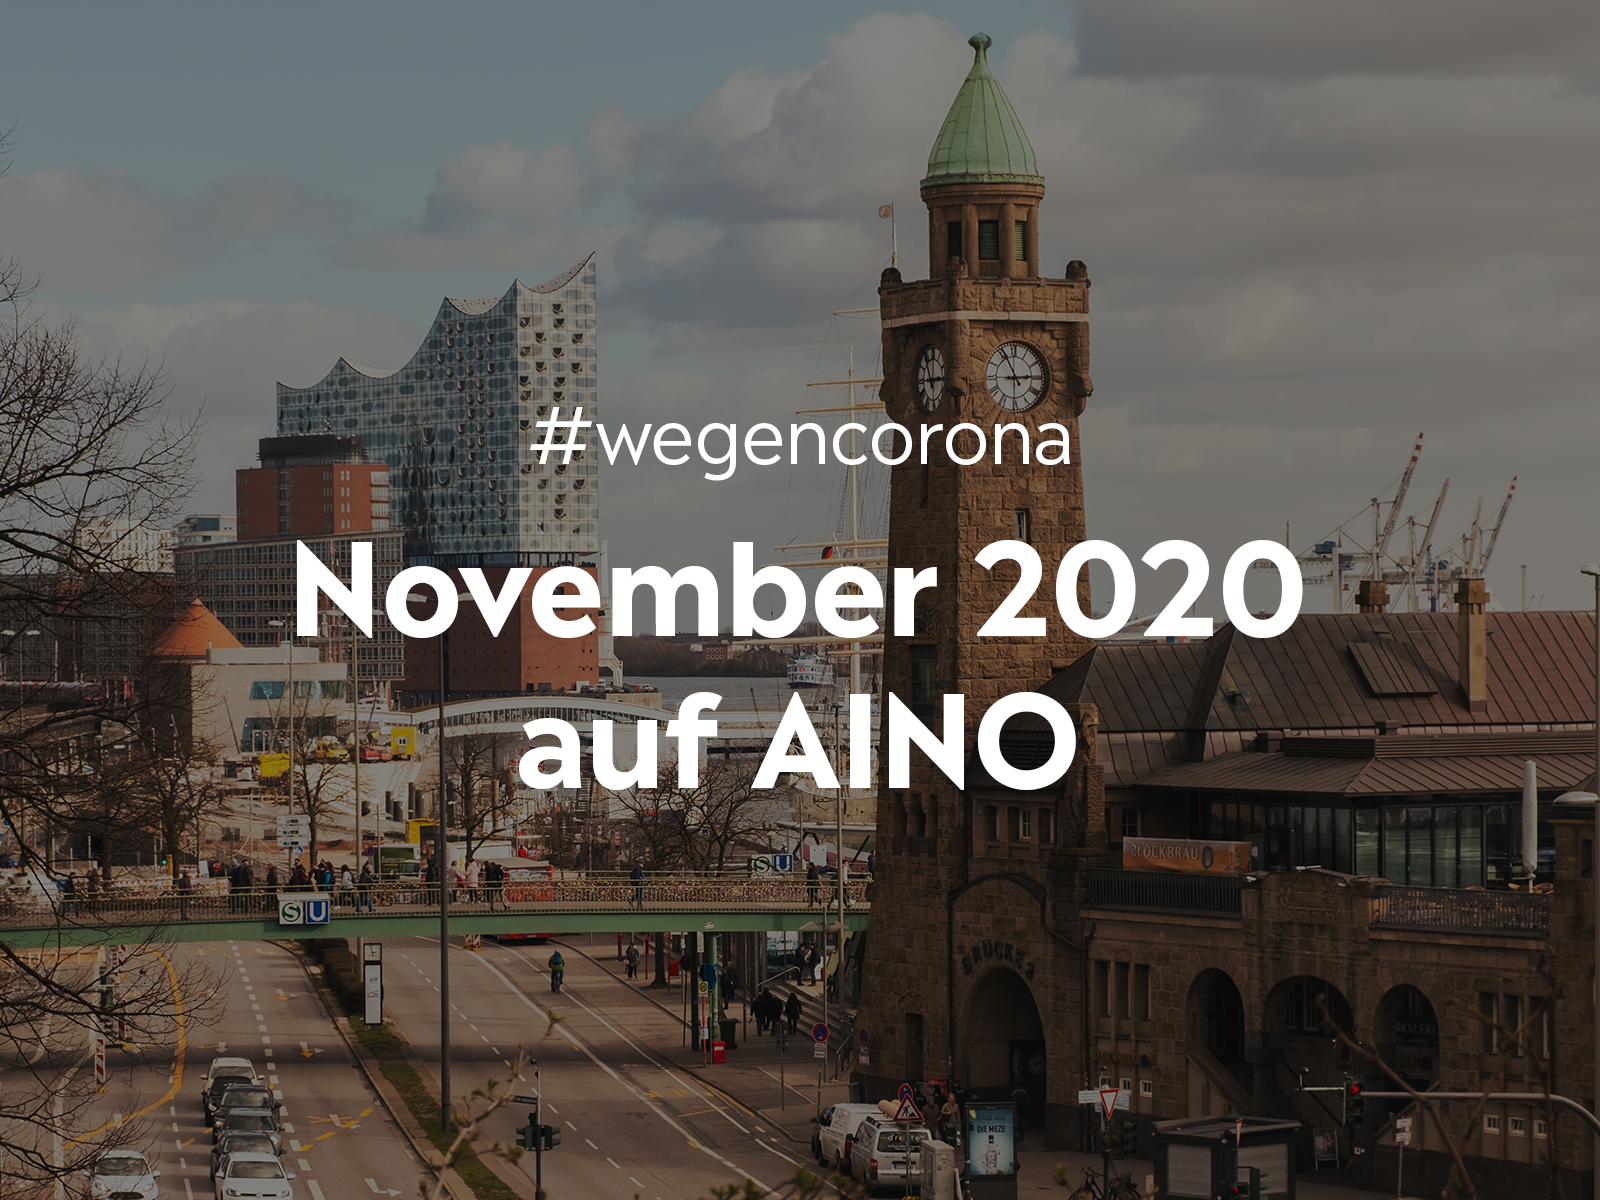 #wegencorona: Das macht AINO für dich im November